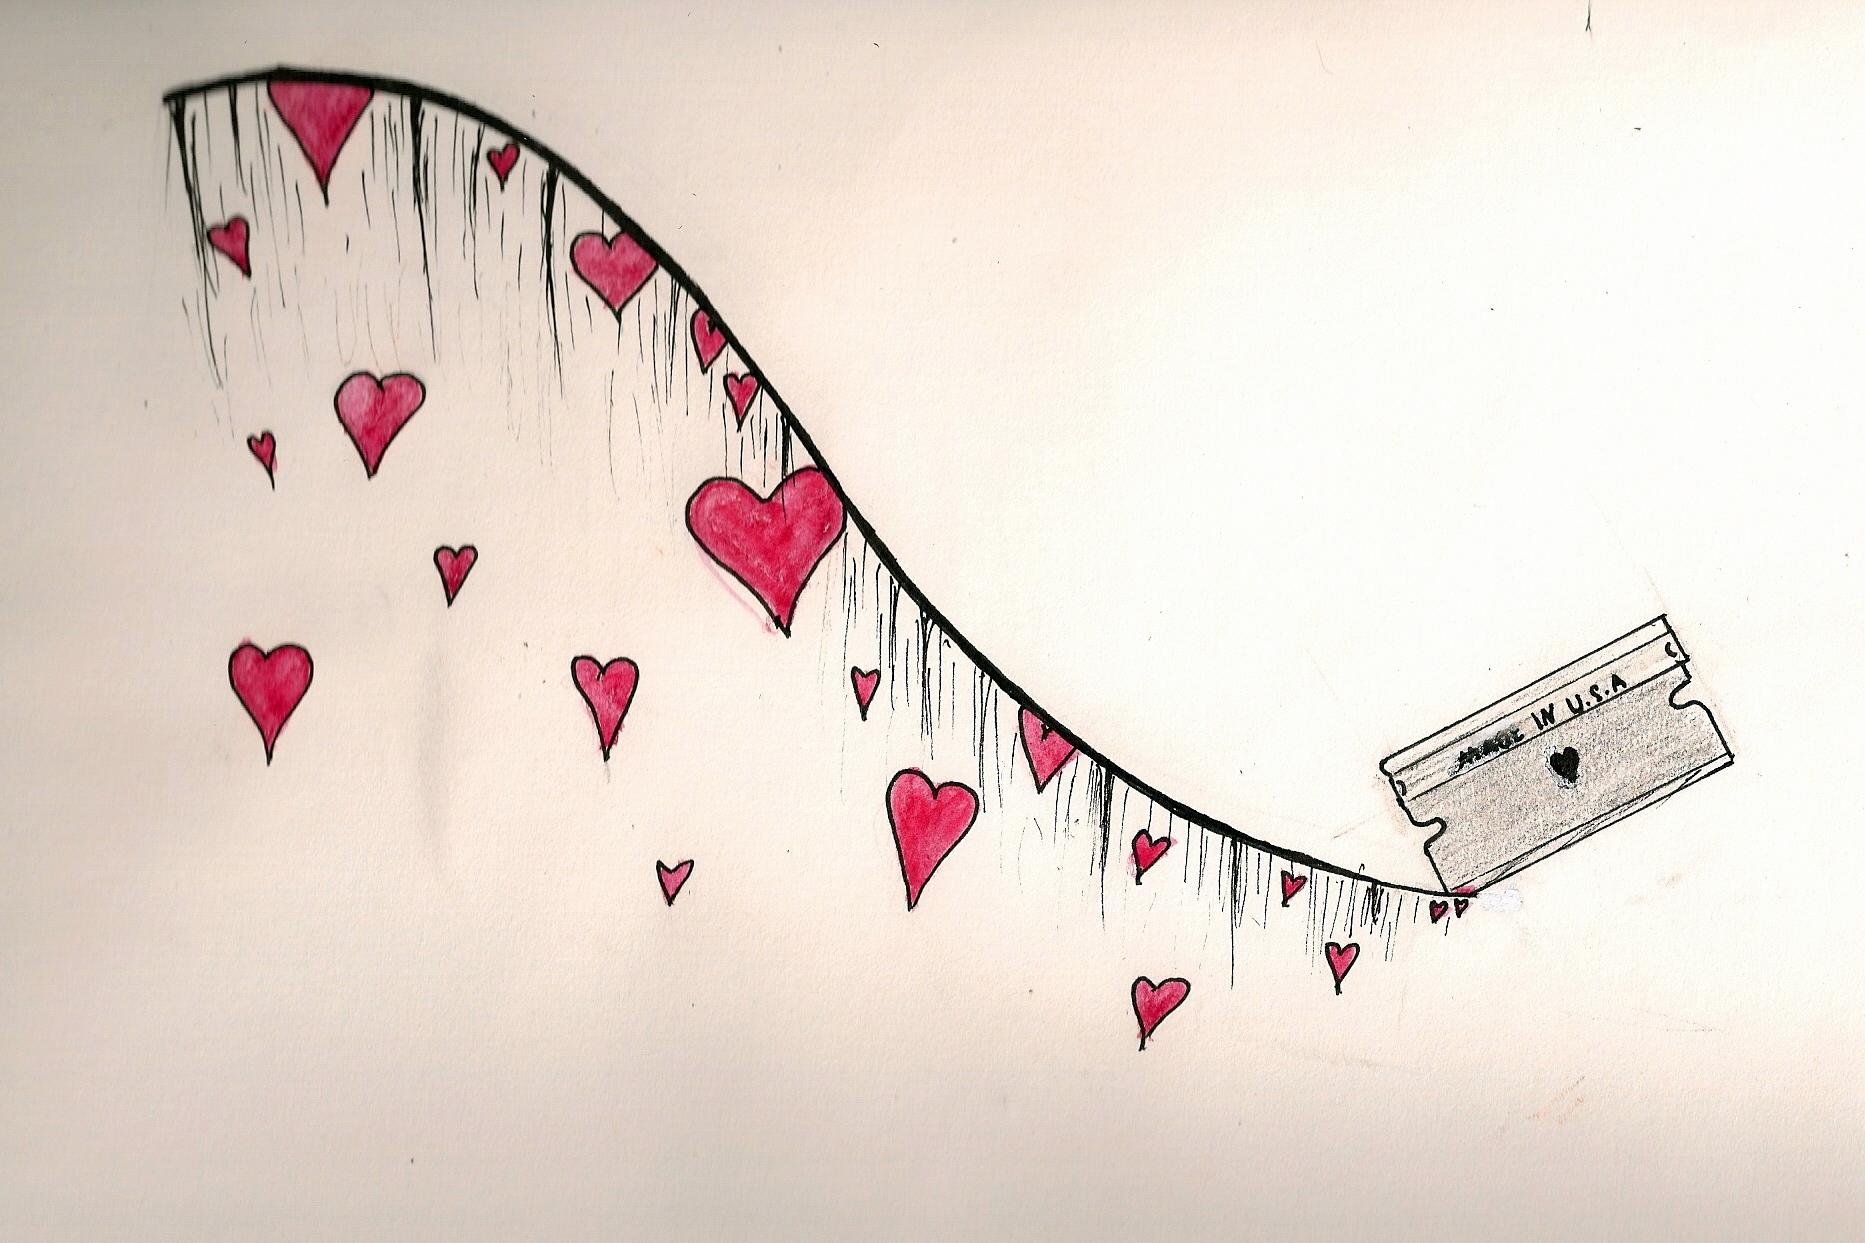 razor_blade_love_by_xxmrs_toddxx.jpg